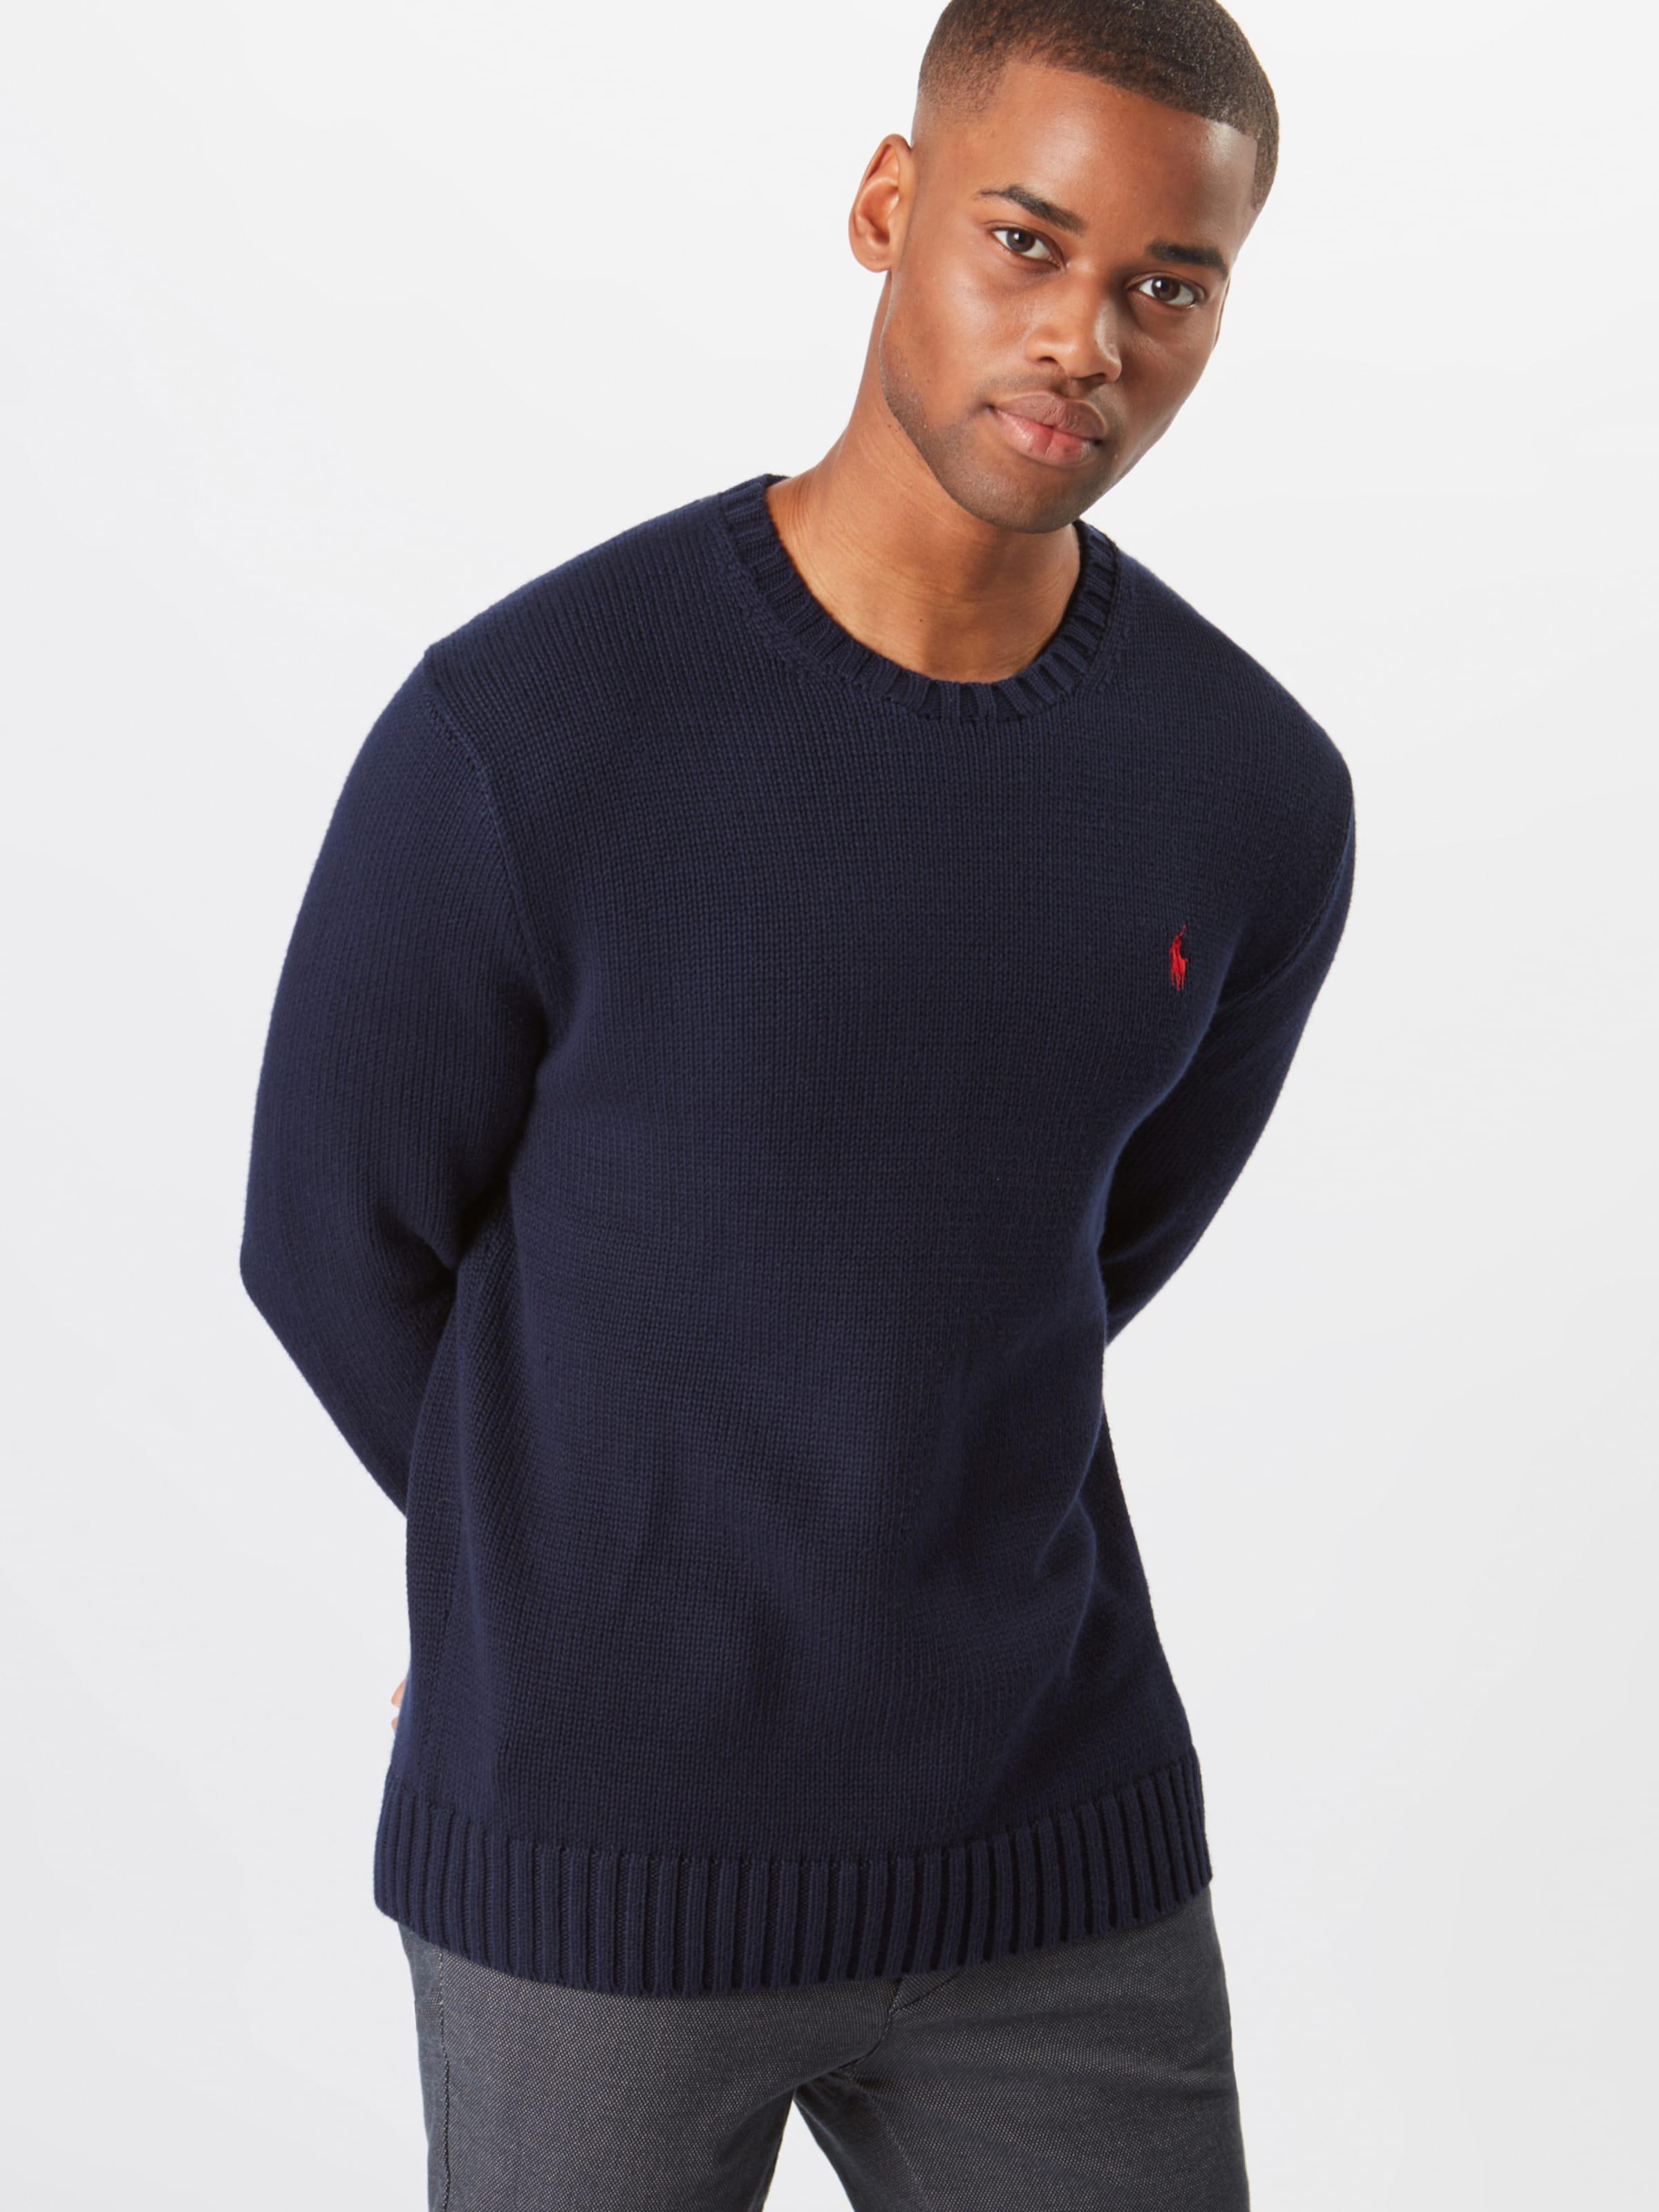 Pullover Ralph Lauren Polo Dunkelblau In bY7y6gf